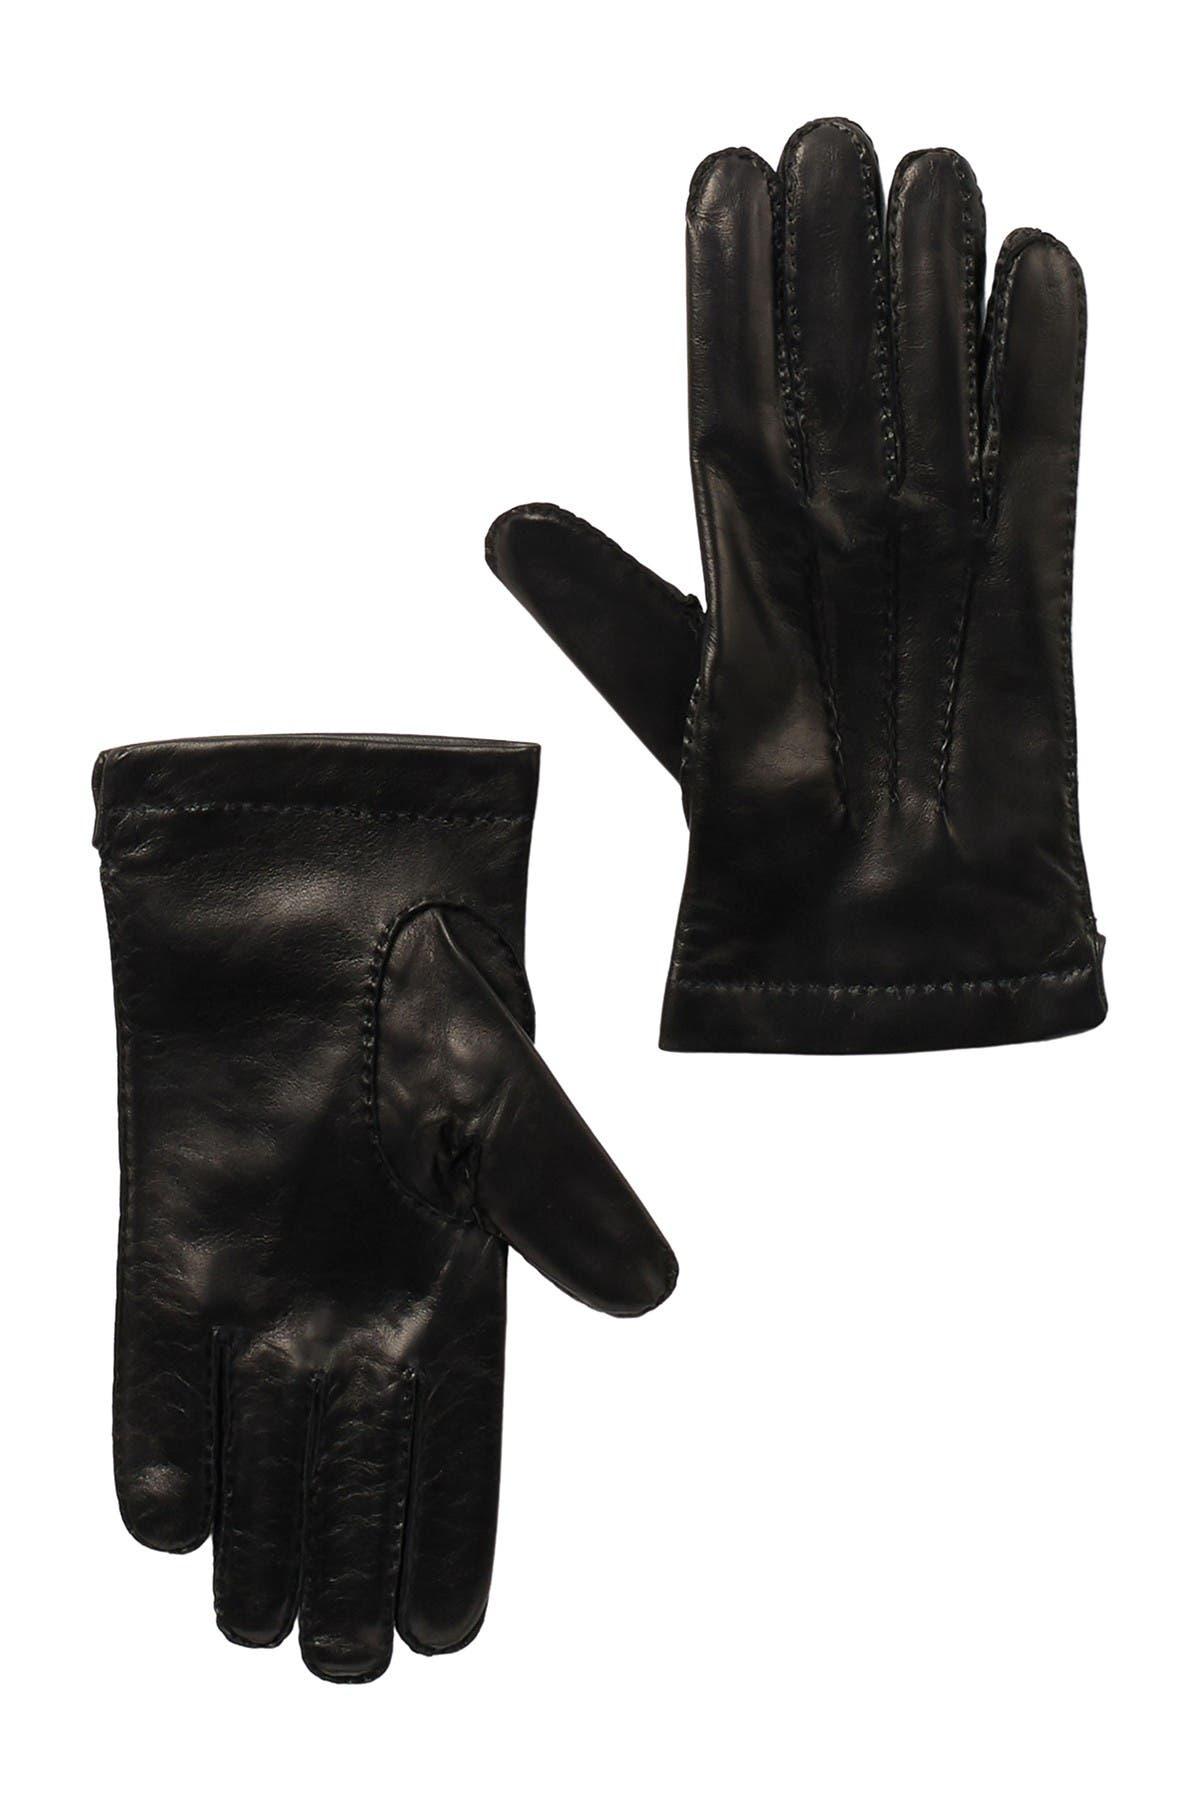 Image of Portolano Handsewn Nappa Leather Gloves